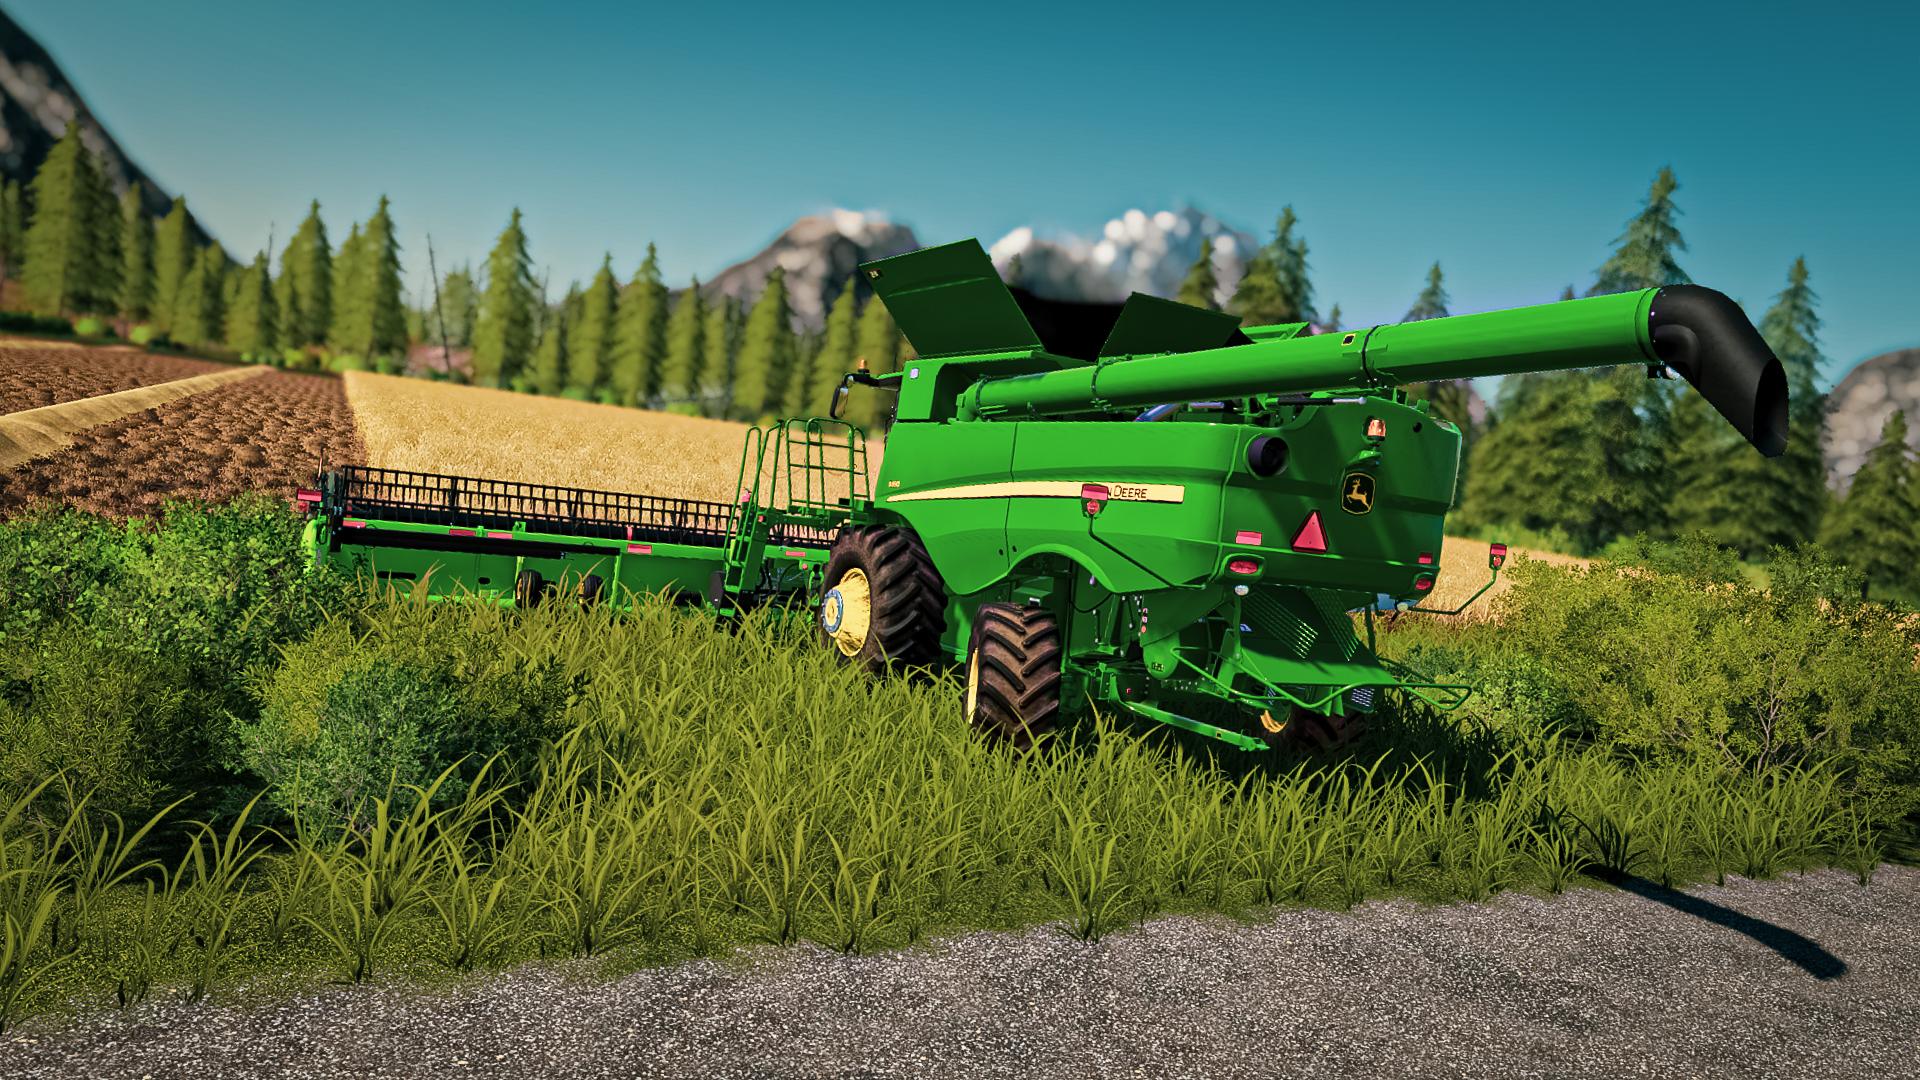 General 1920x1080 farming simulator farming simulator 2019 forest Harvest barley farm screen shot PC gaming vehicle